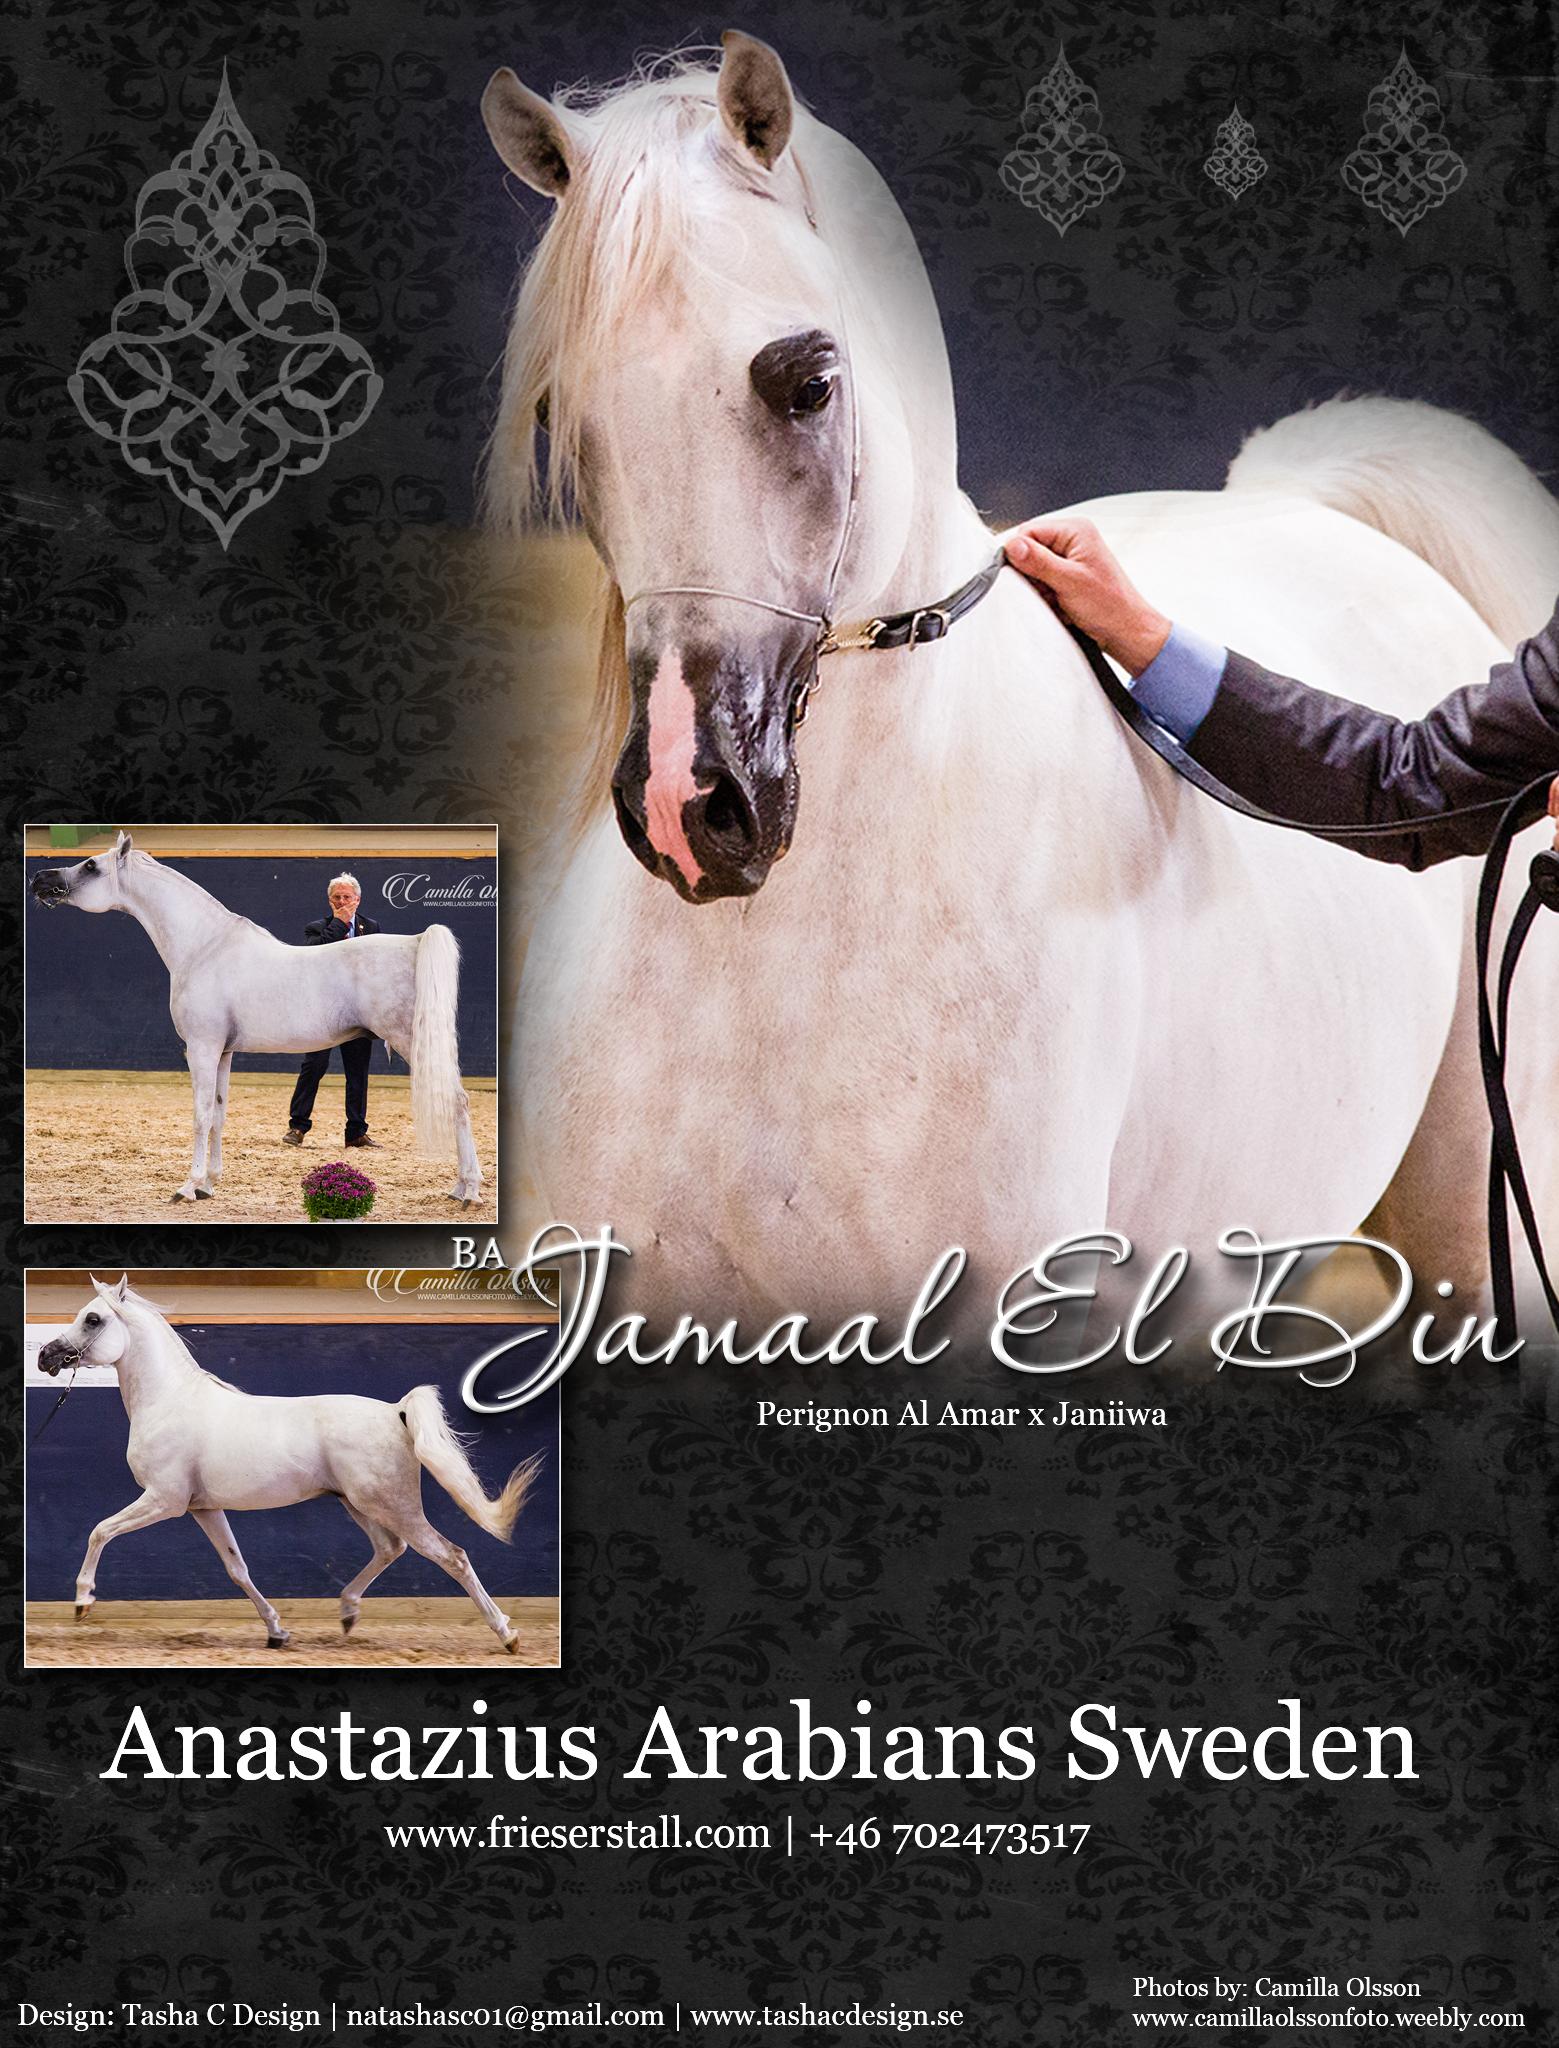 Fernando - Anastazius Arabians